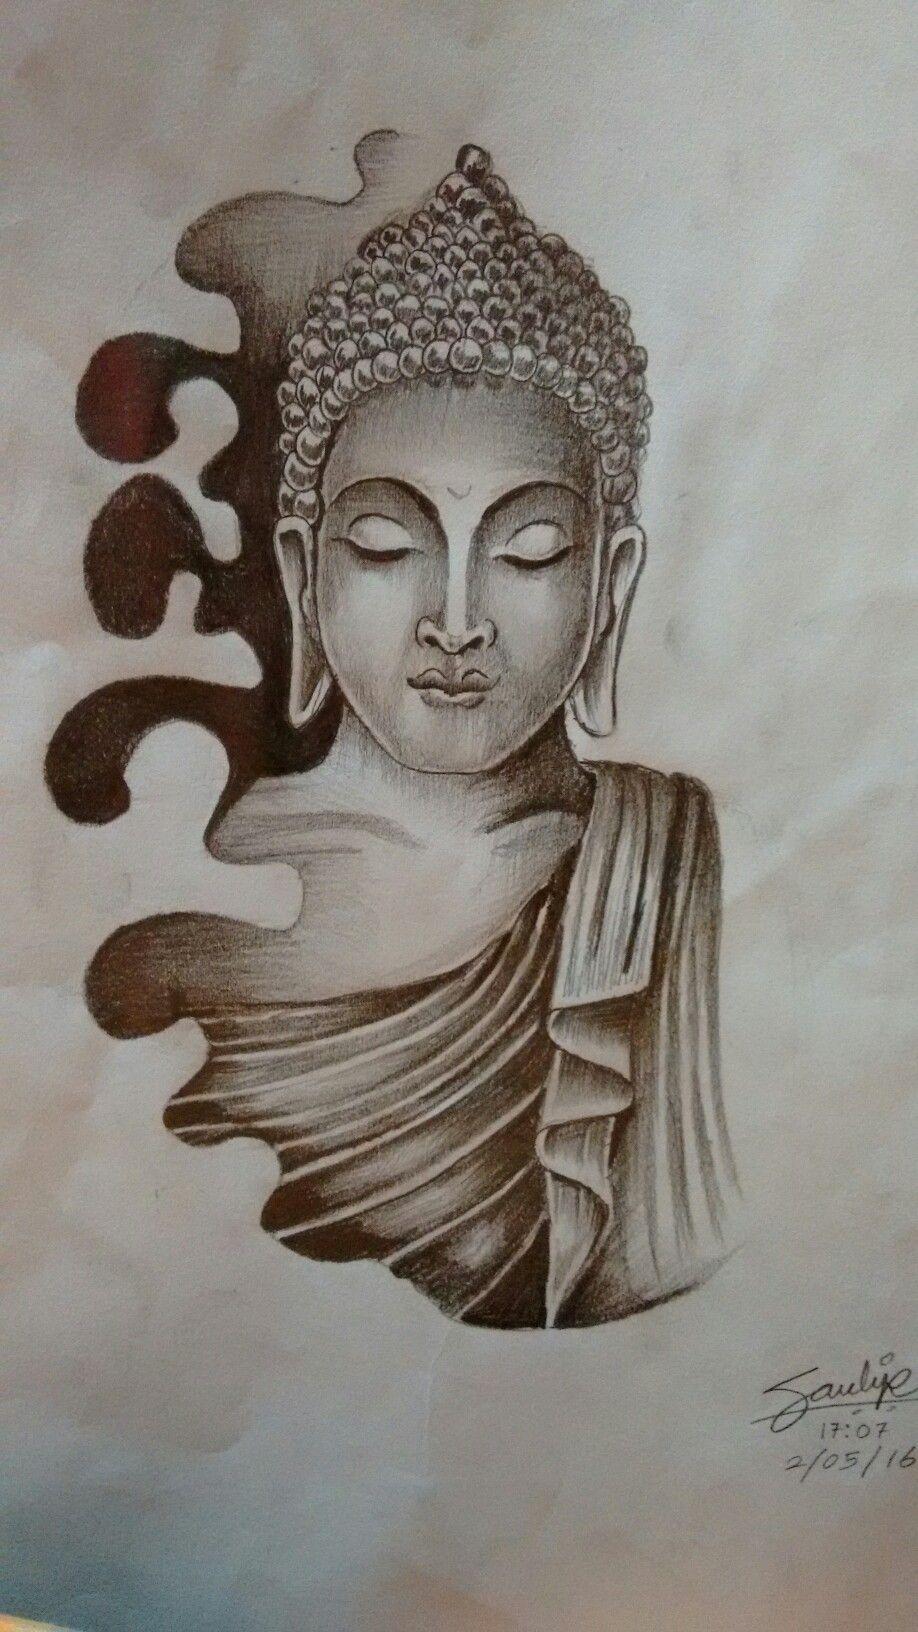 Lord buddha drawing by artist sandip